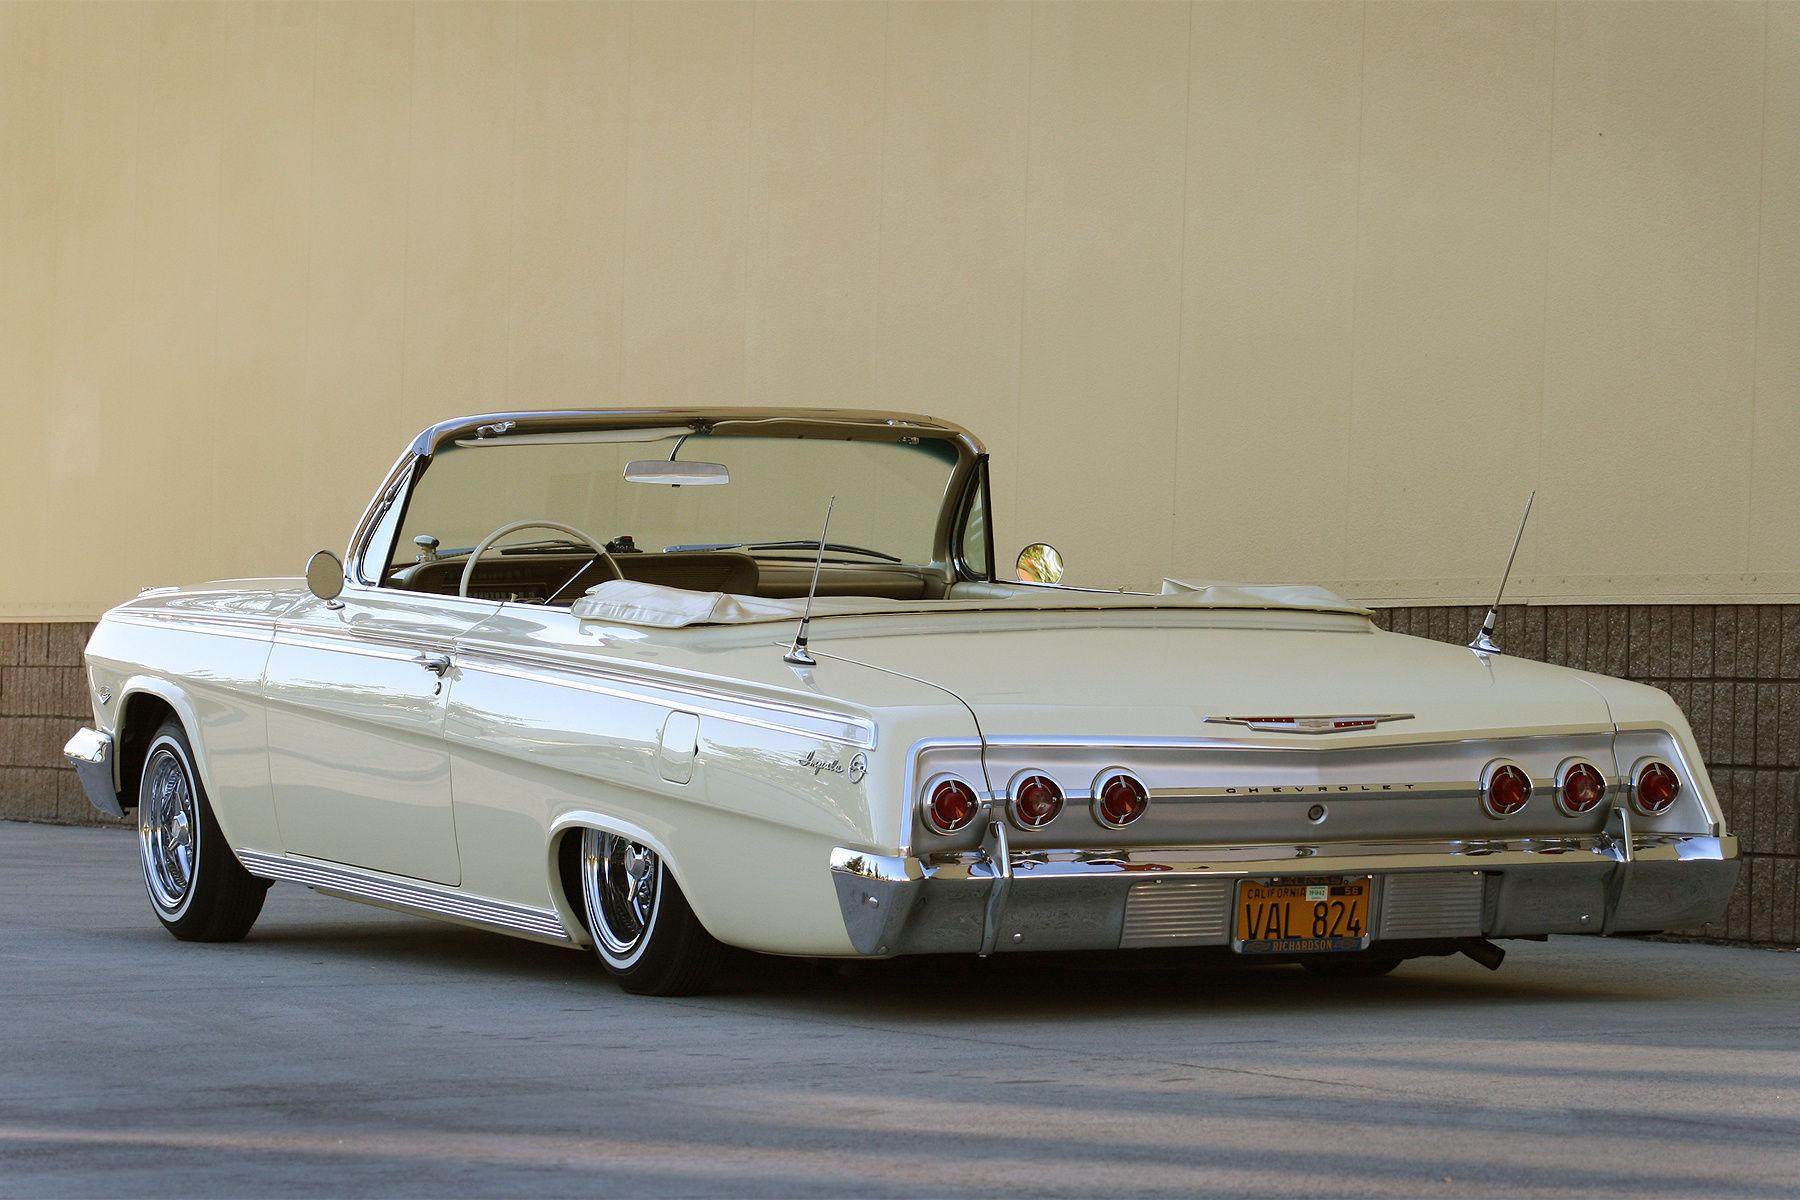 1962 Chevrolet Impala | Big Watcha's 1962 Impala Convertible